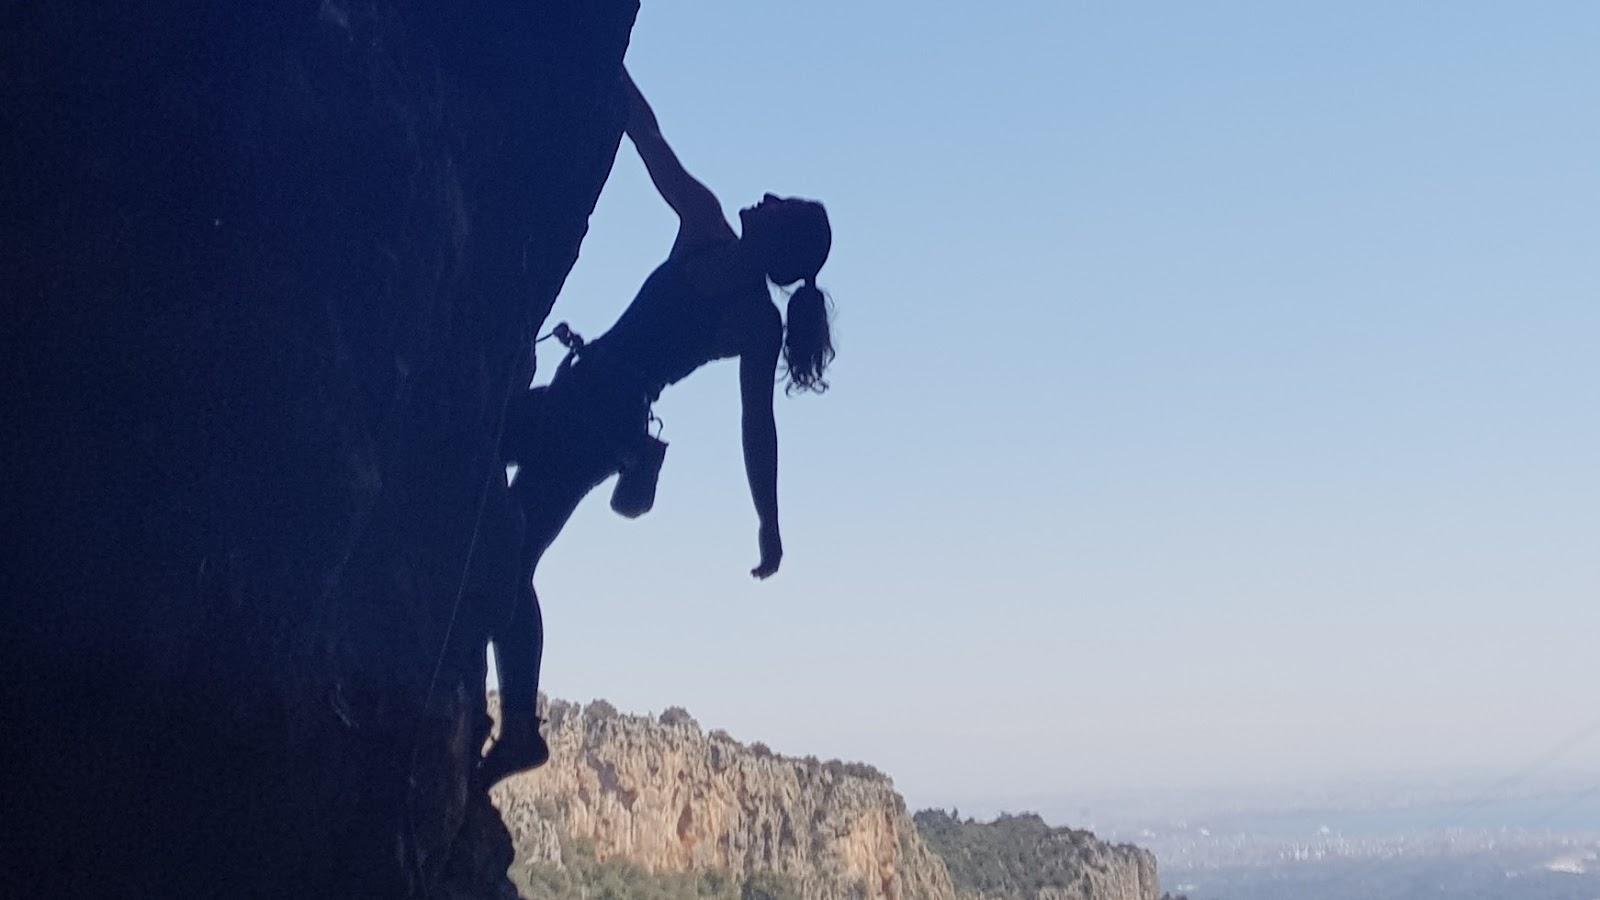 Kaya Tırmanışı geyikbayırı